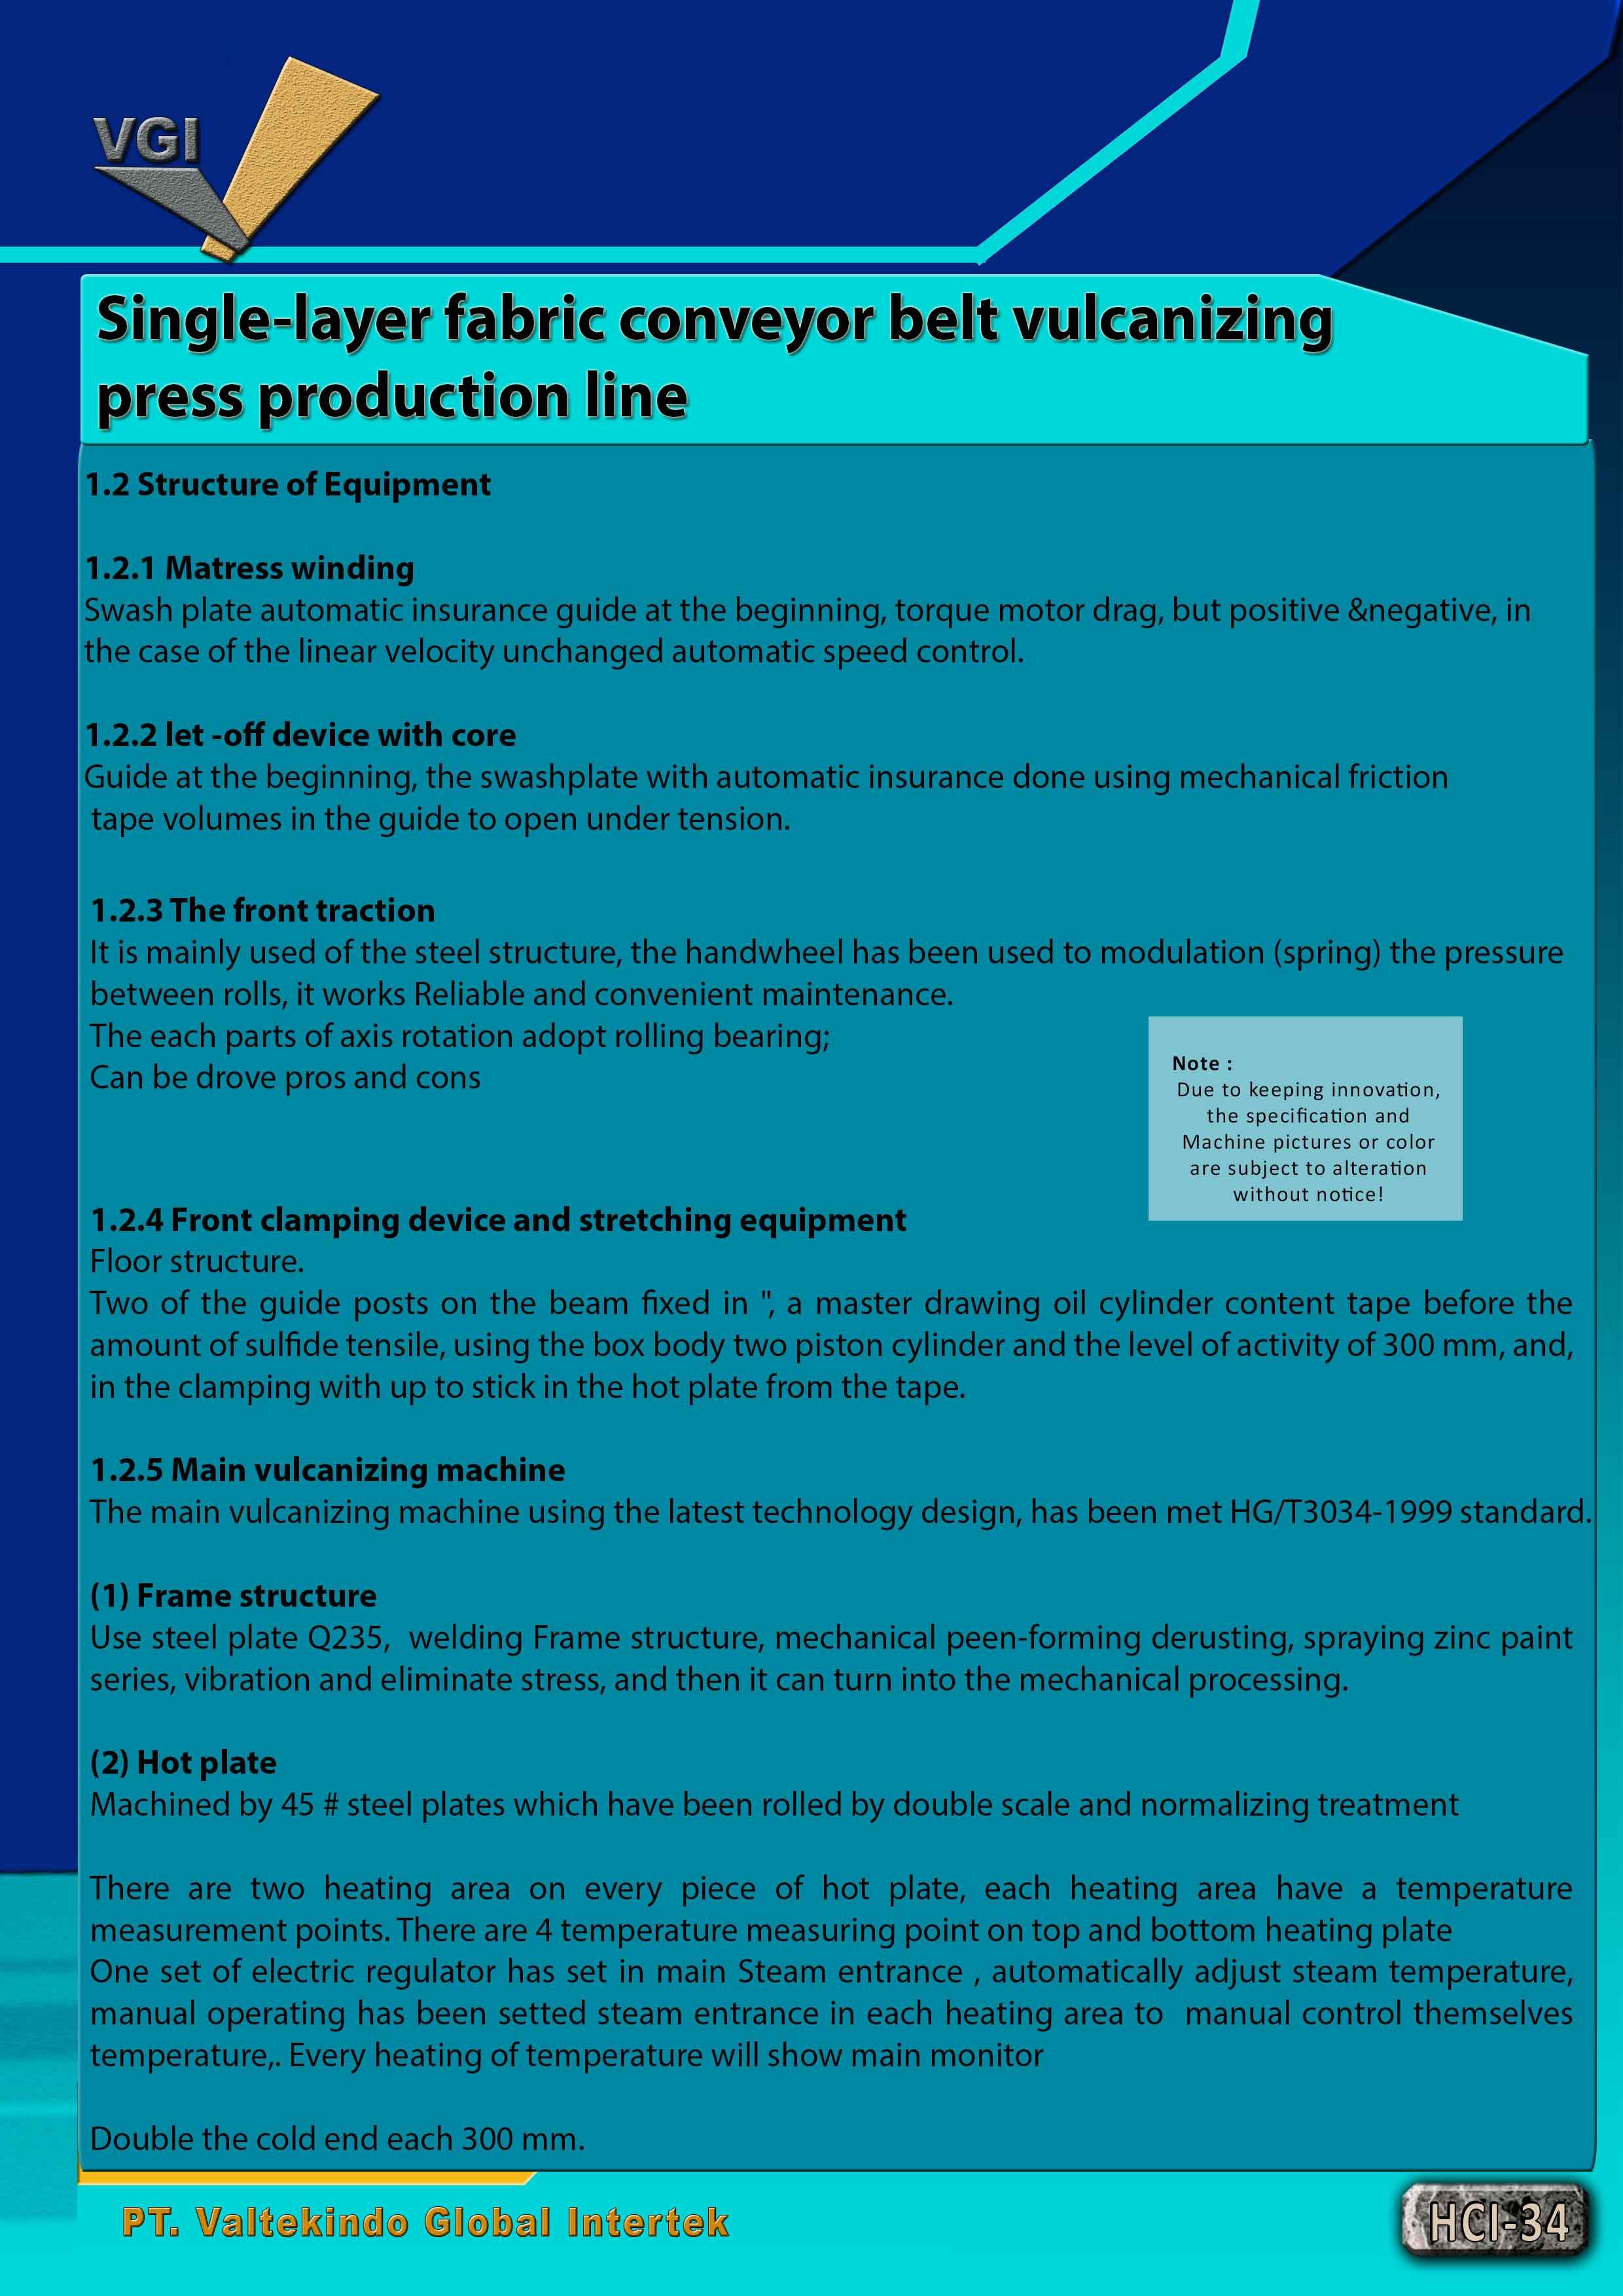 jual mesin Single-layer fabric conveyor belt vulcanizing press production line 3 Single-layer fabric conveyor belt vulcanizing press production line 3